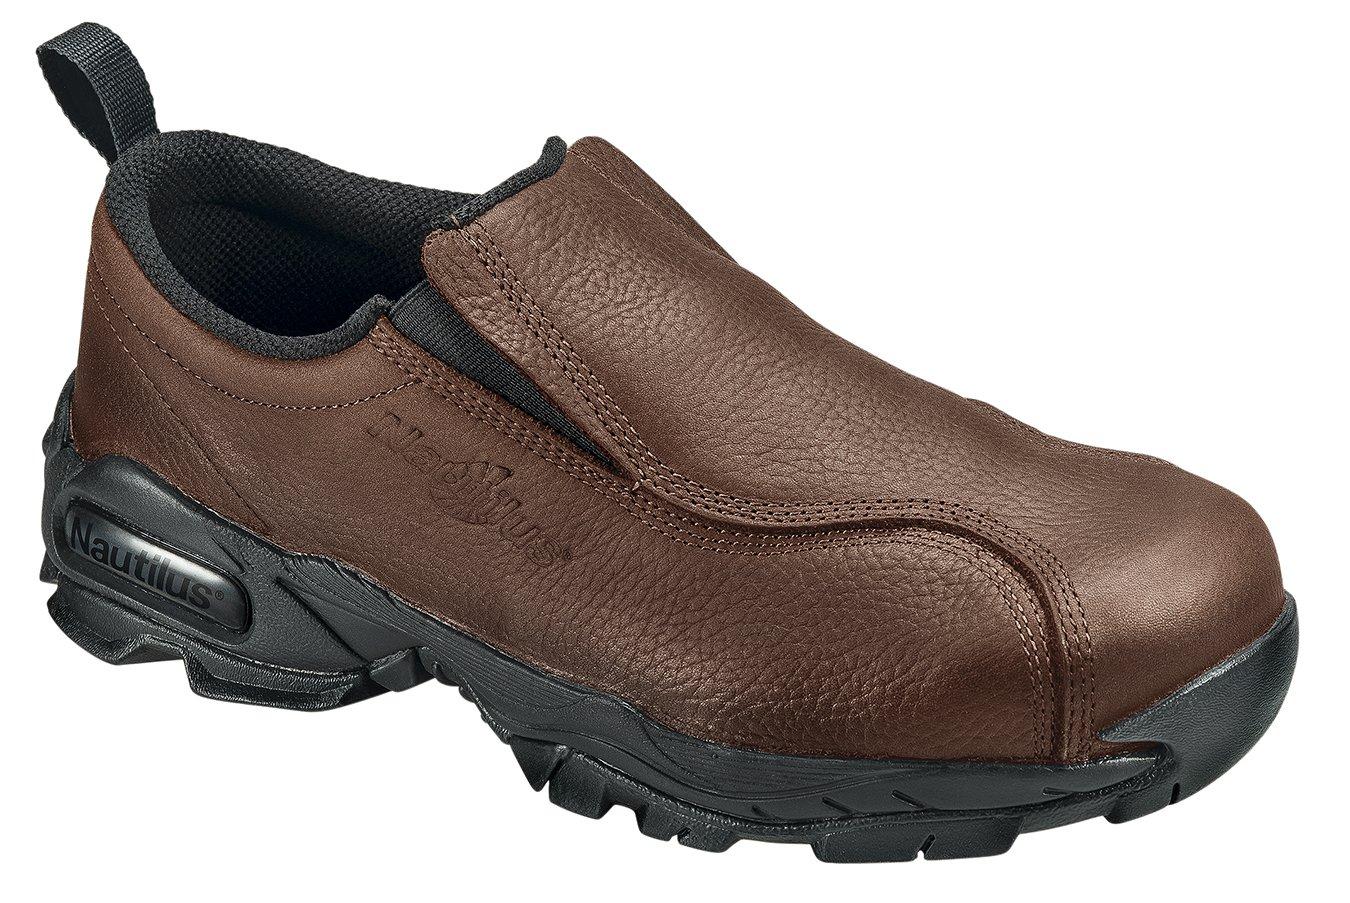 Nautilus Women's Water Resistant Slip On Oxfords,Brown,8 W